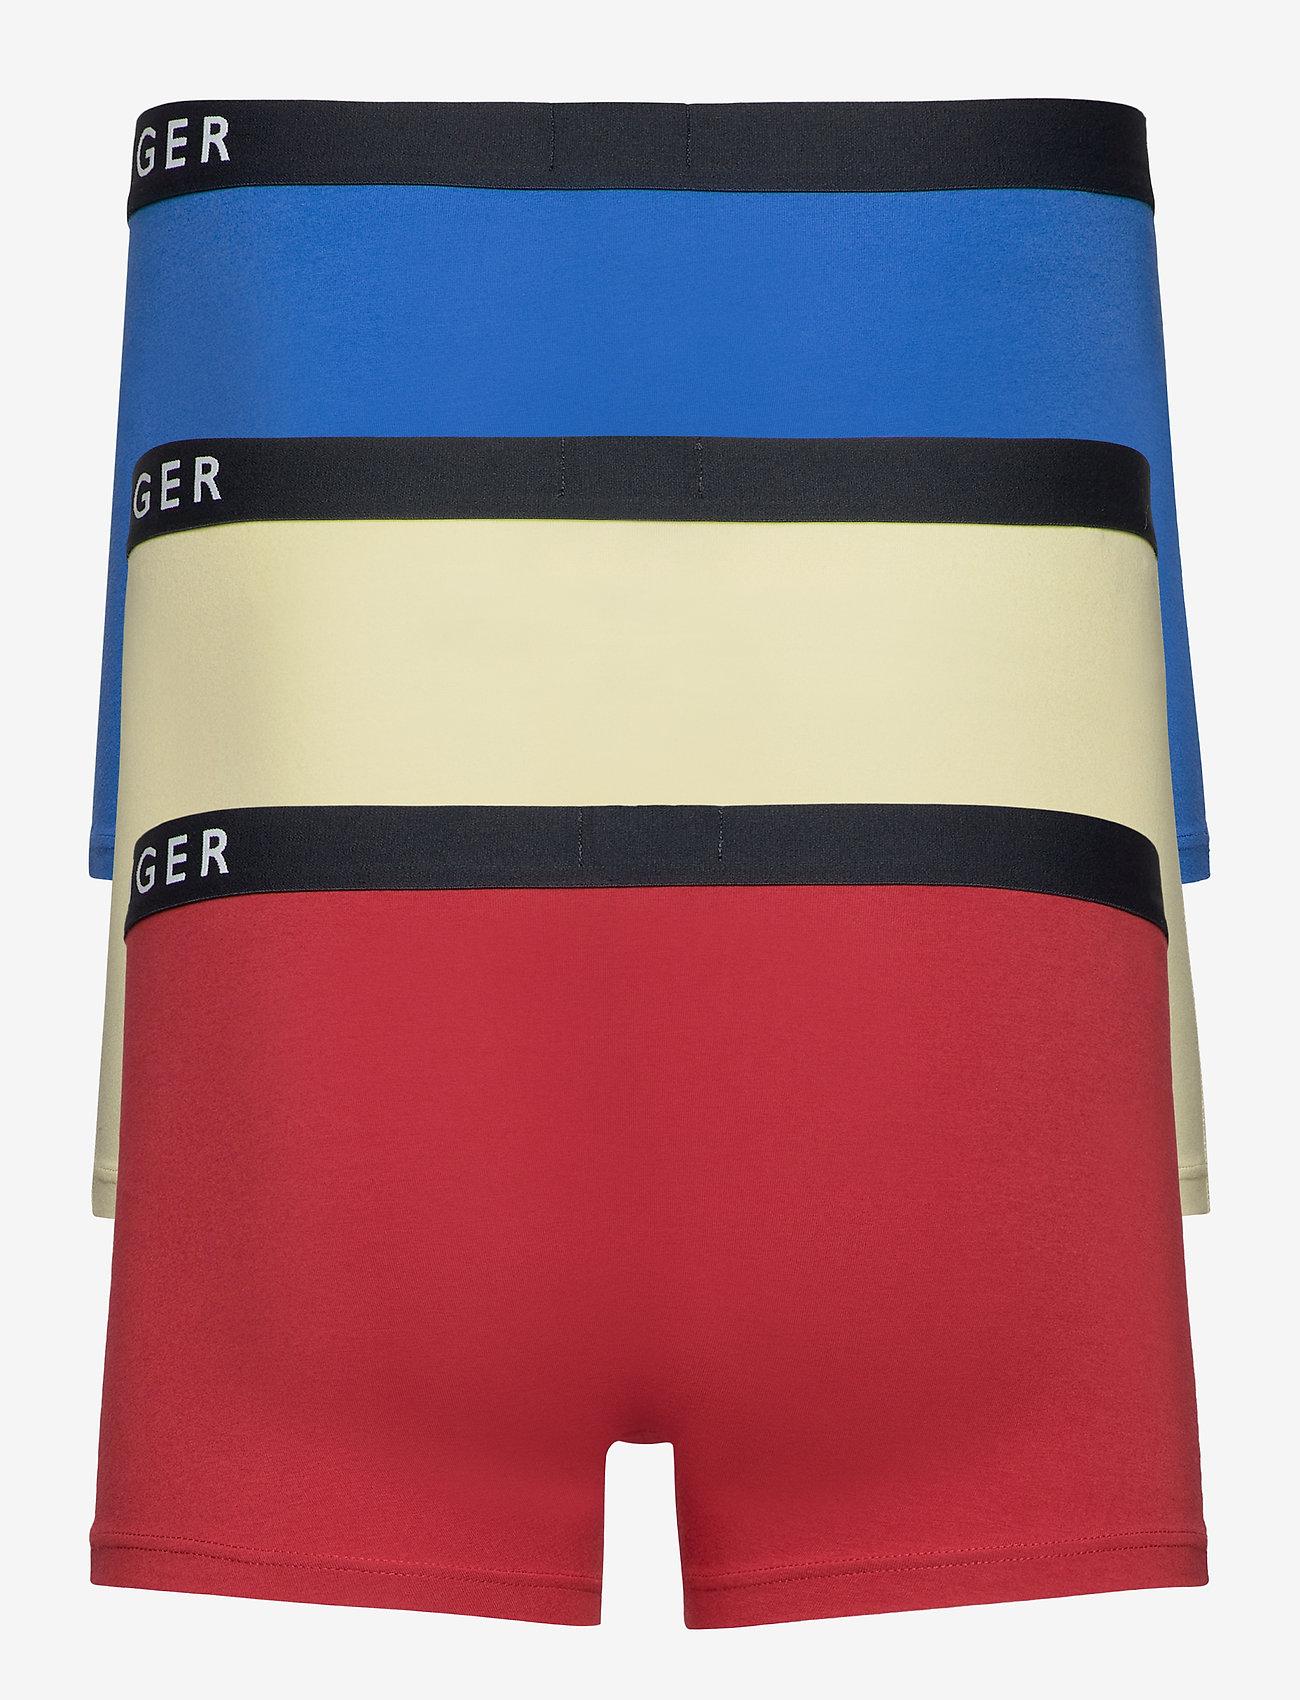 Tommy Hilfiger - 3P TRUNK - caleçon - frost lmn/regata red/th elctc blue - 1